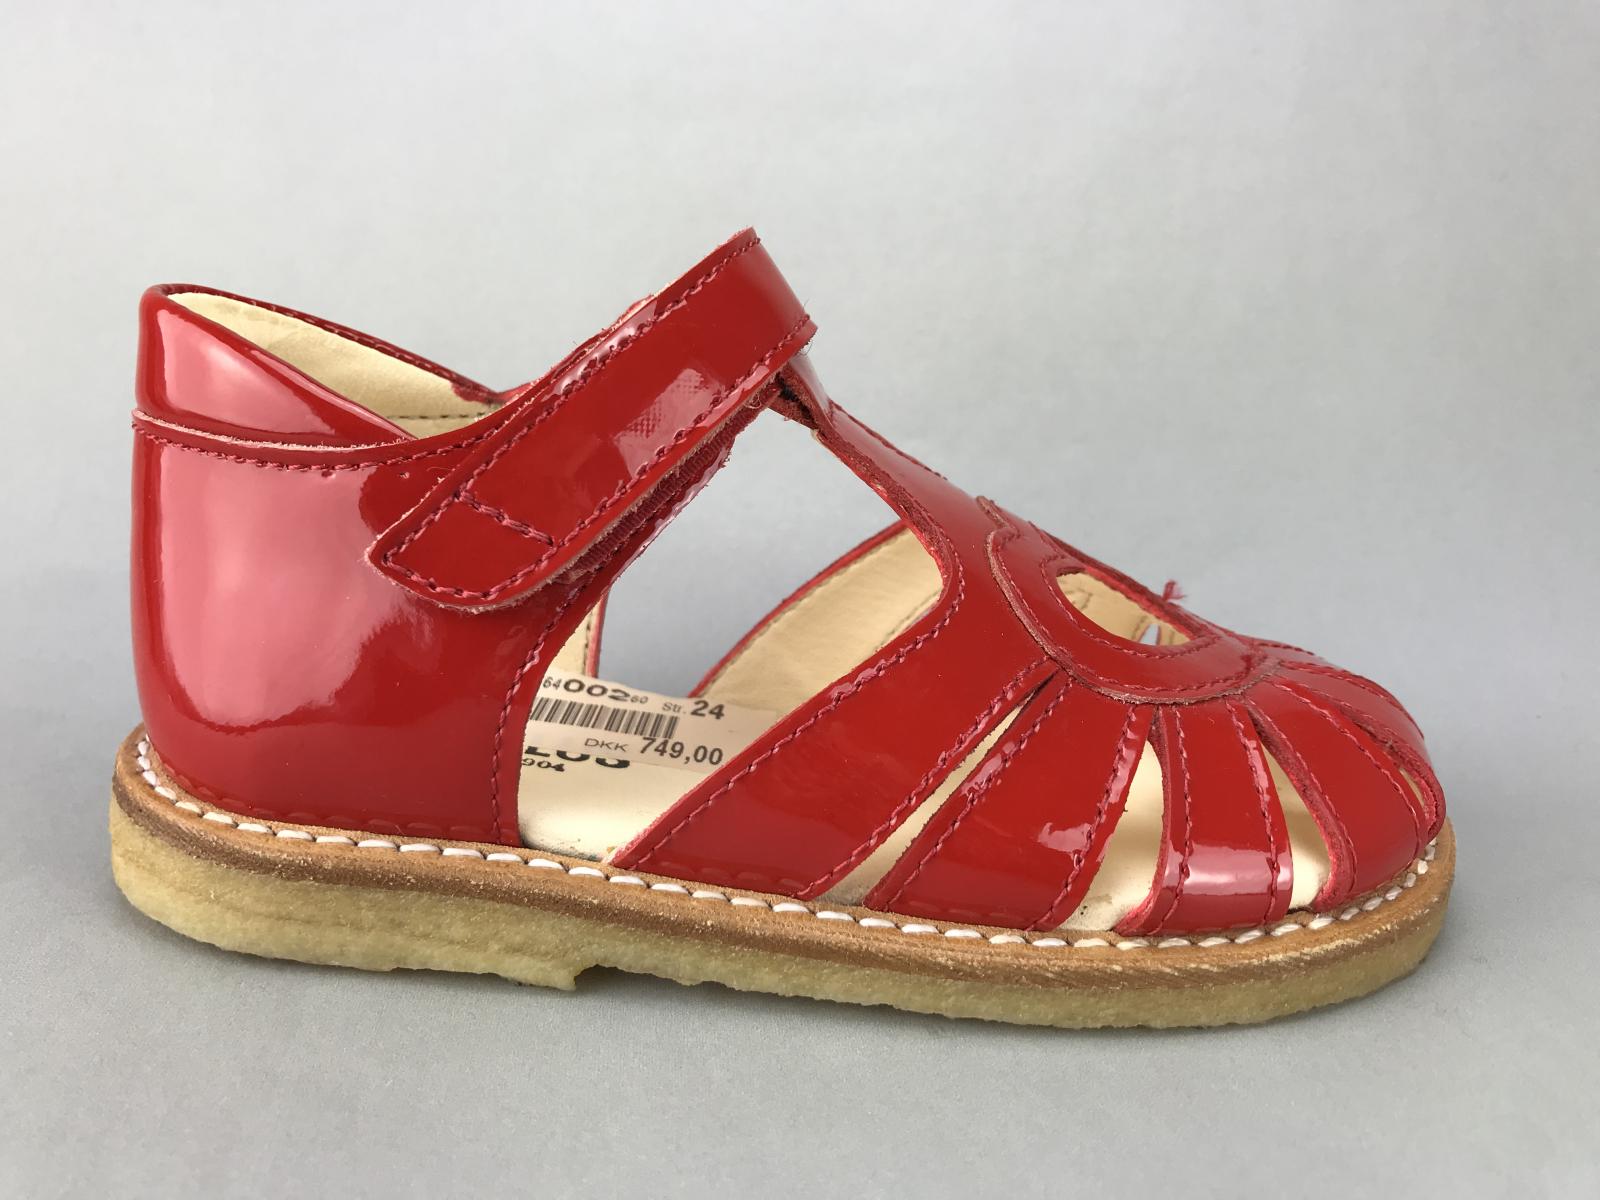 4fe04925a31d Angulus pige sandal - rød lak - BØRN - zjoos-hjoerring.dk